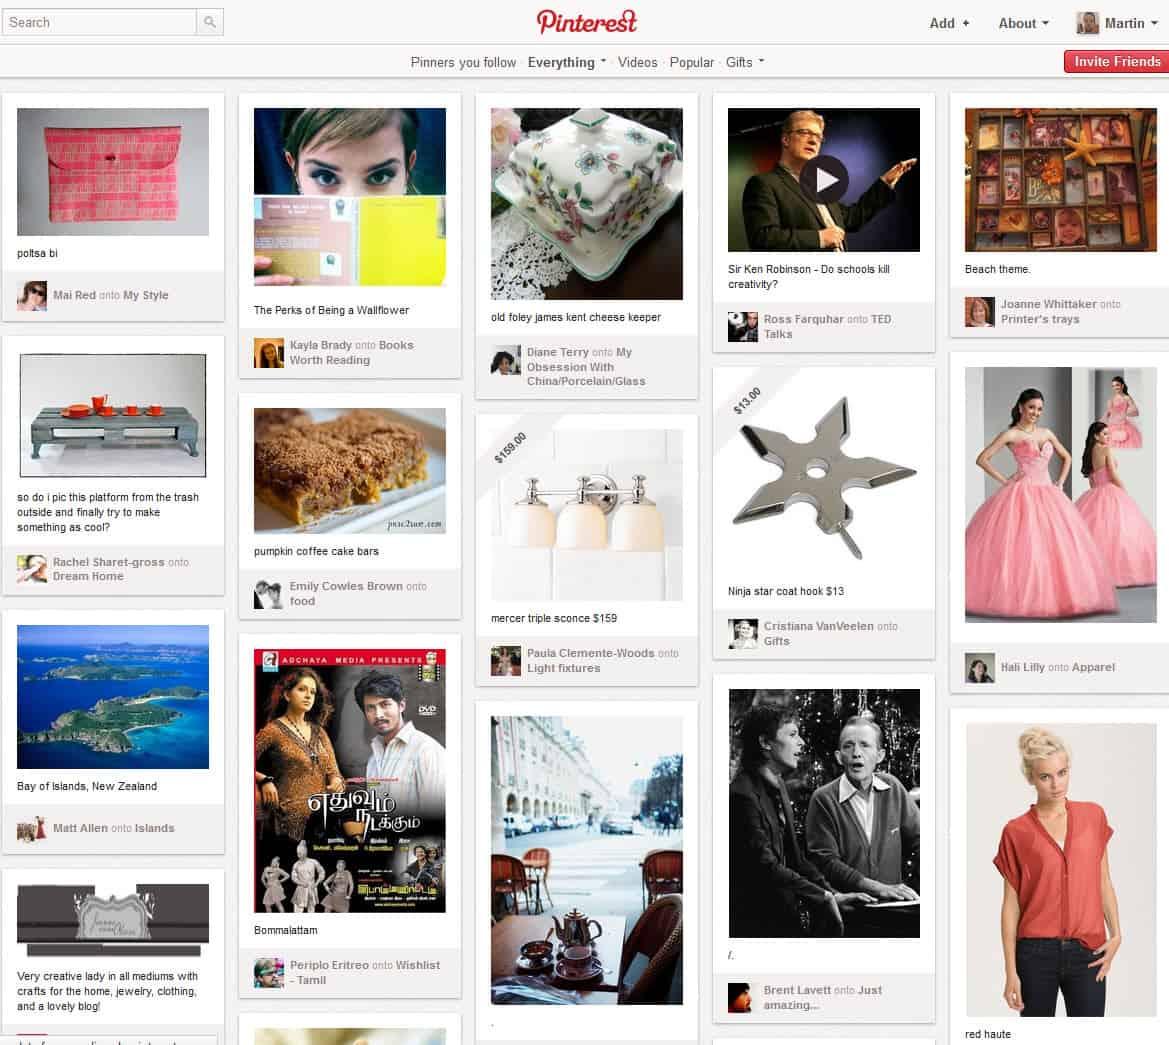 Pinterest.com All